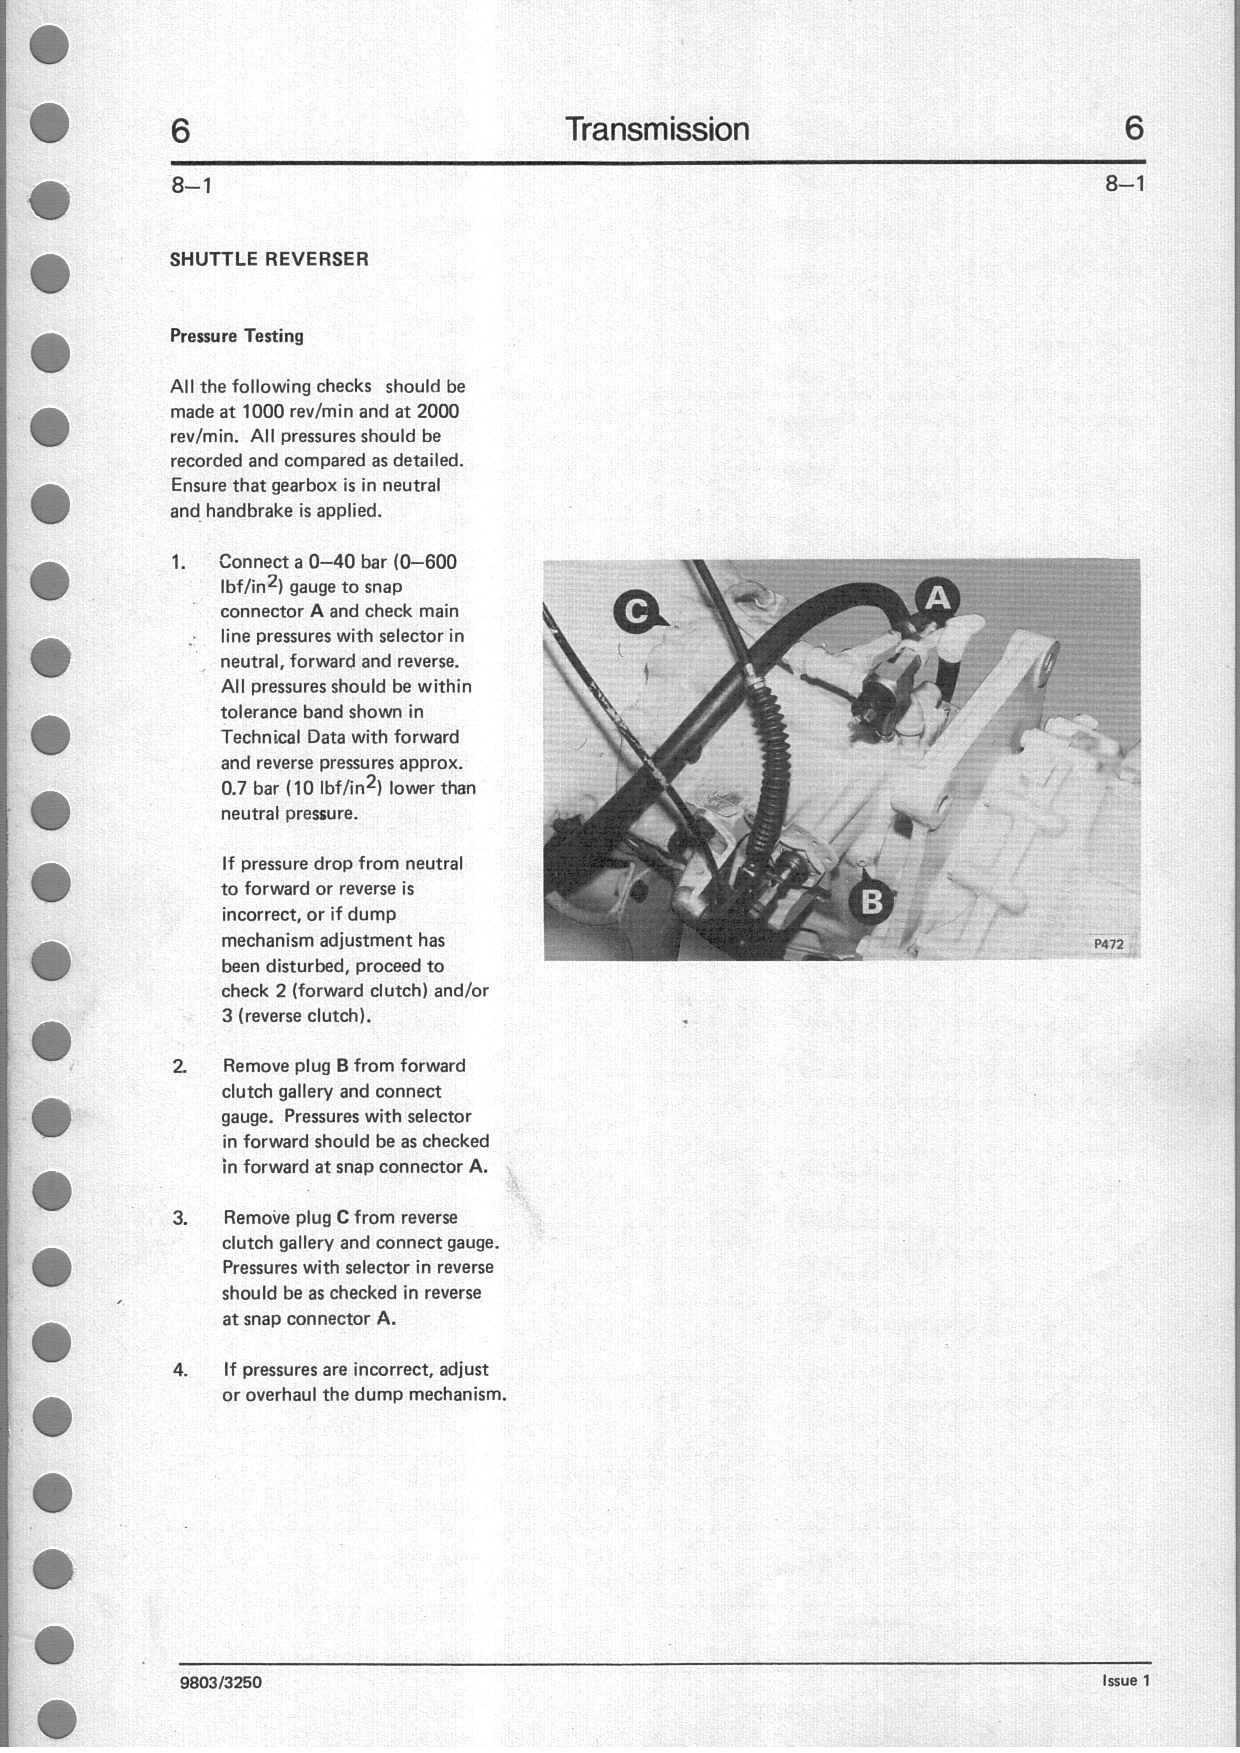 jcb 1400b wiring schematic wiring diagramwiring diagram for a jcb best wiring libraryjcb 1400b backhoe wiring diagram residential electrical symbols \\